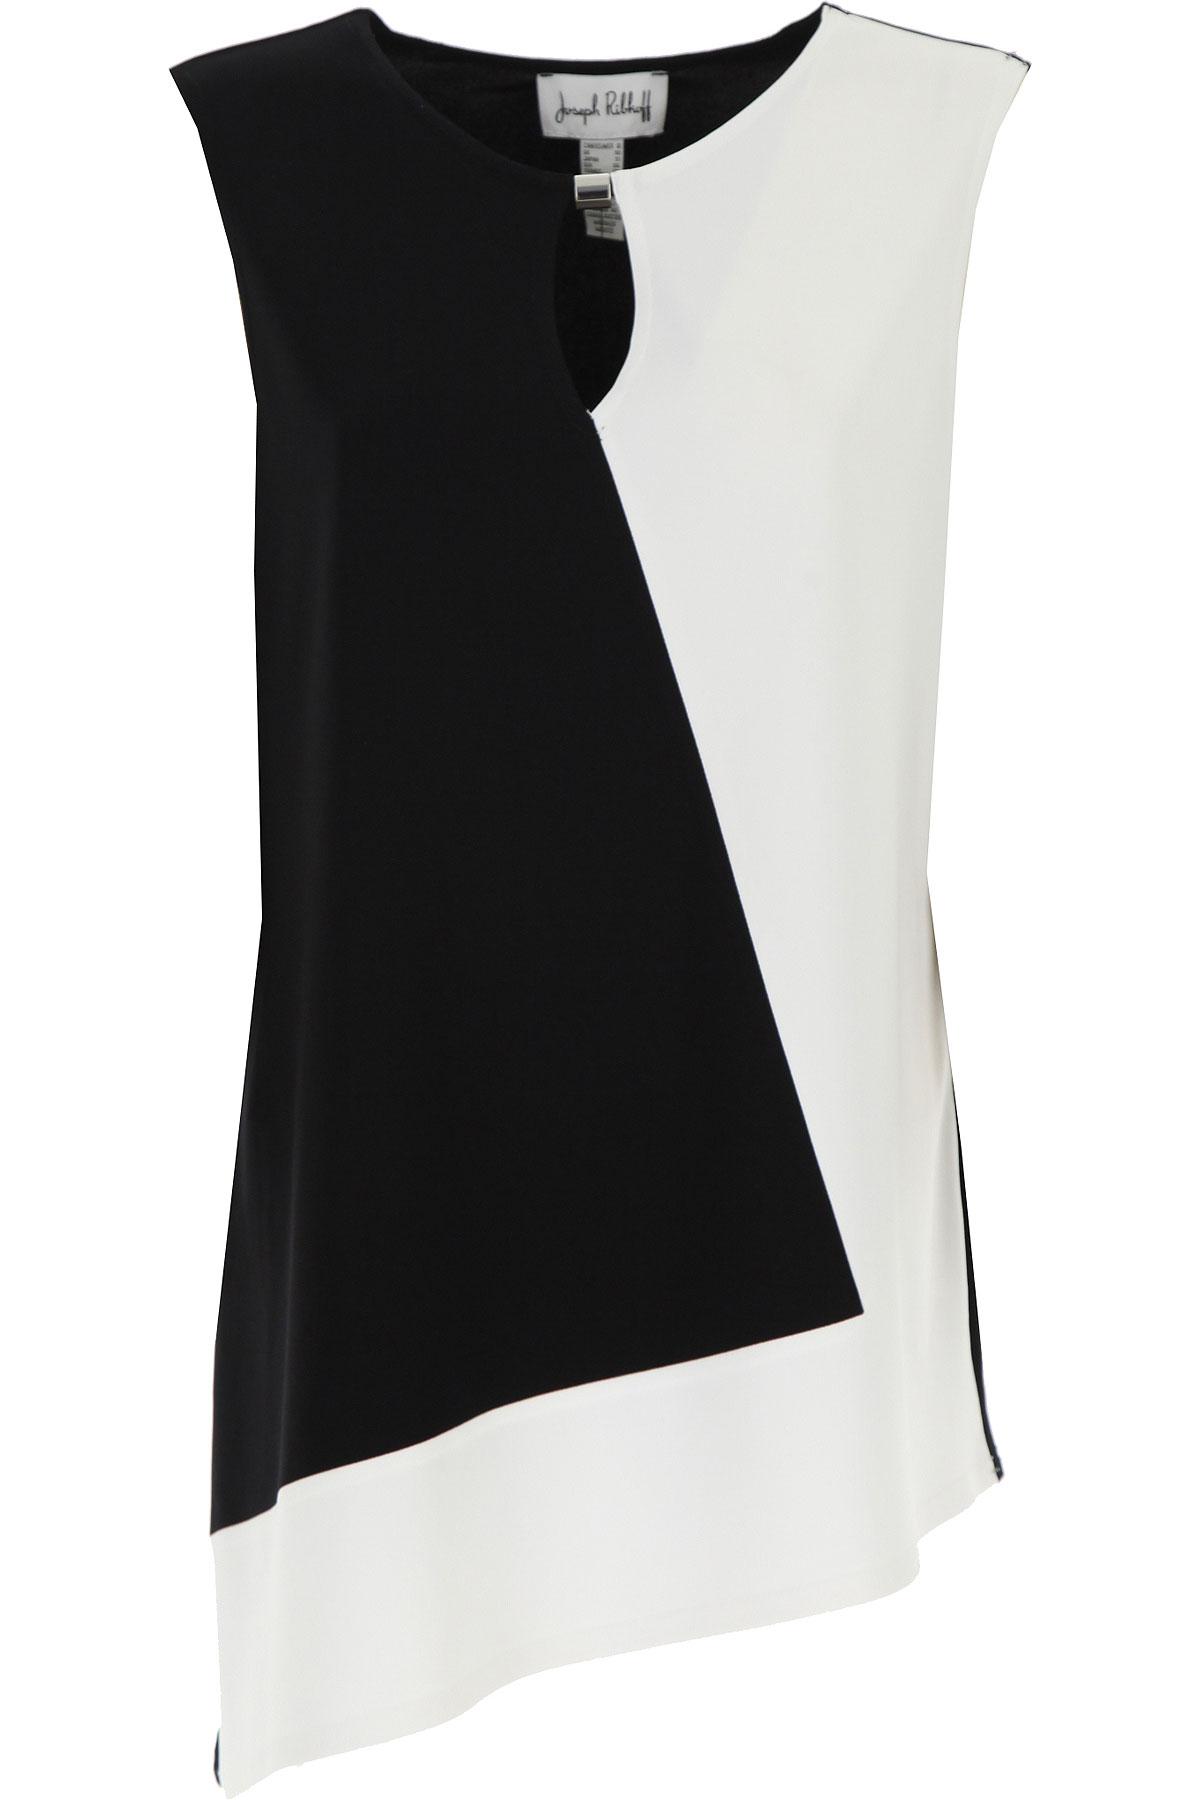 Joseph Ribkoff Top for Women On Sale, Black, polyester, 2019, 10 12 14 6 8